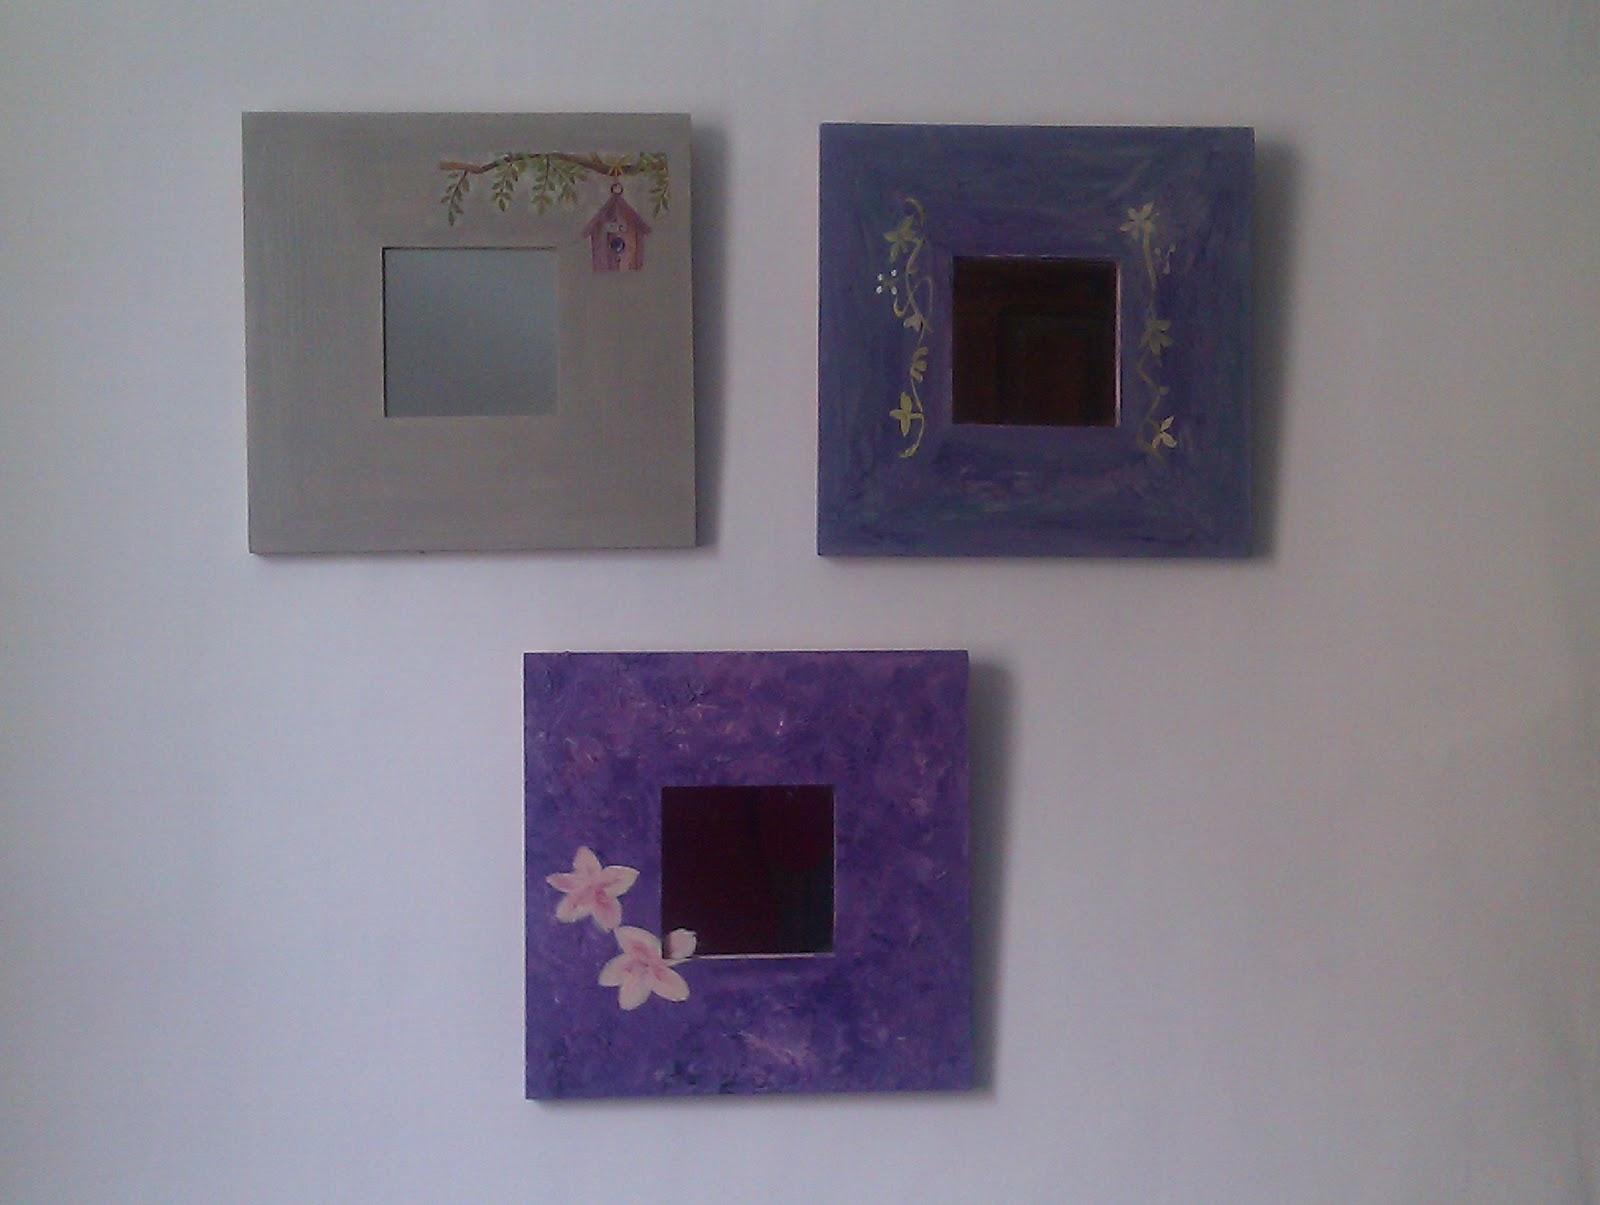 Los famosos cuadros espejos malm piedra papel o az car for Espejos como decorarlos